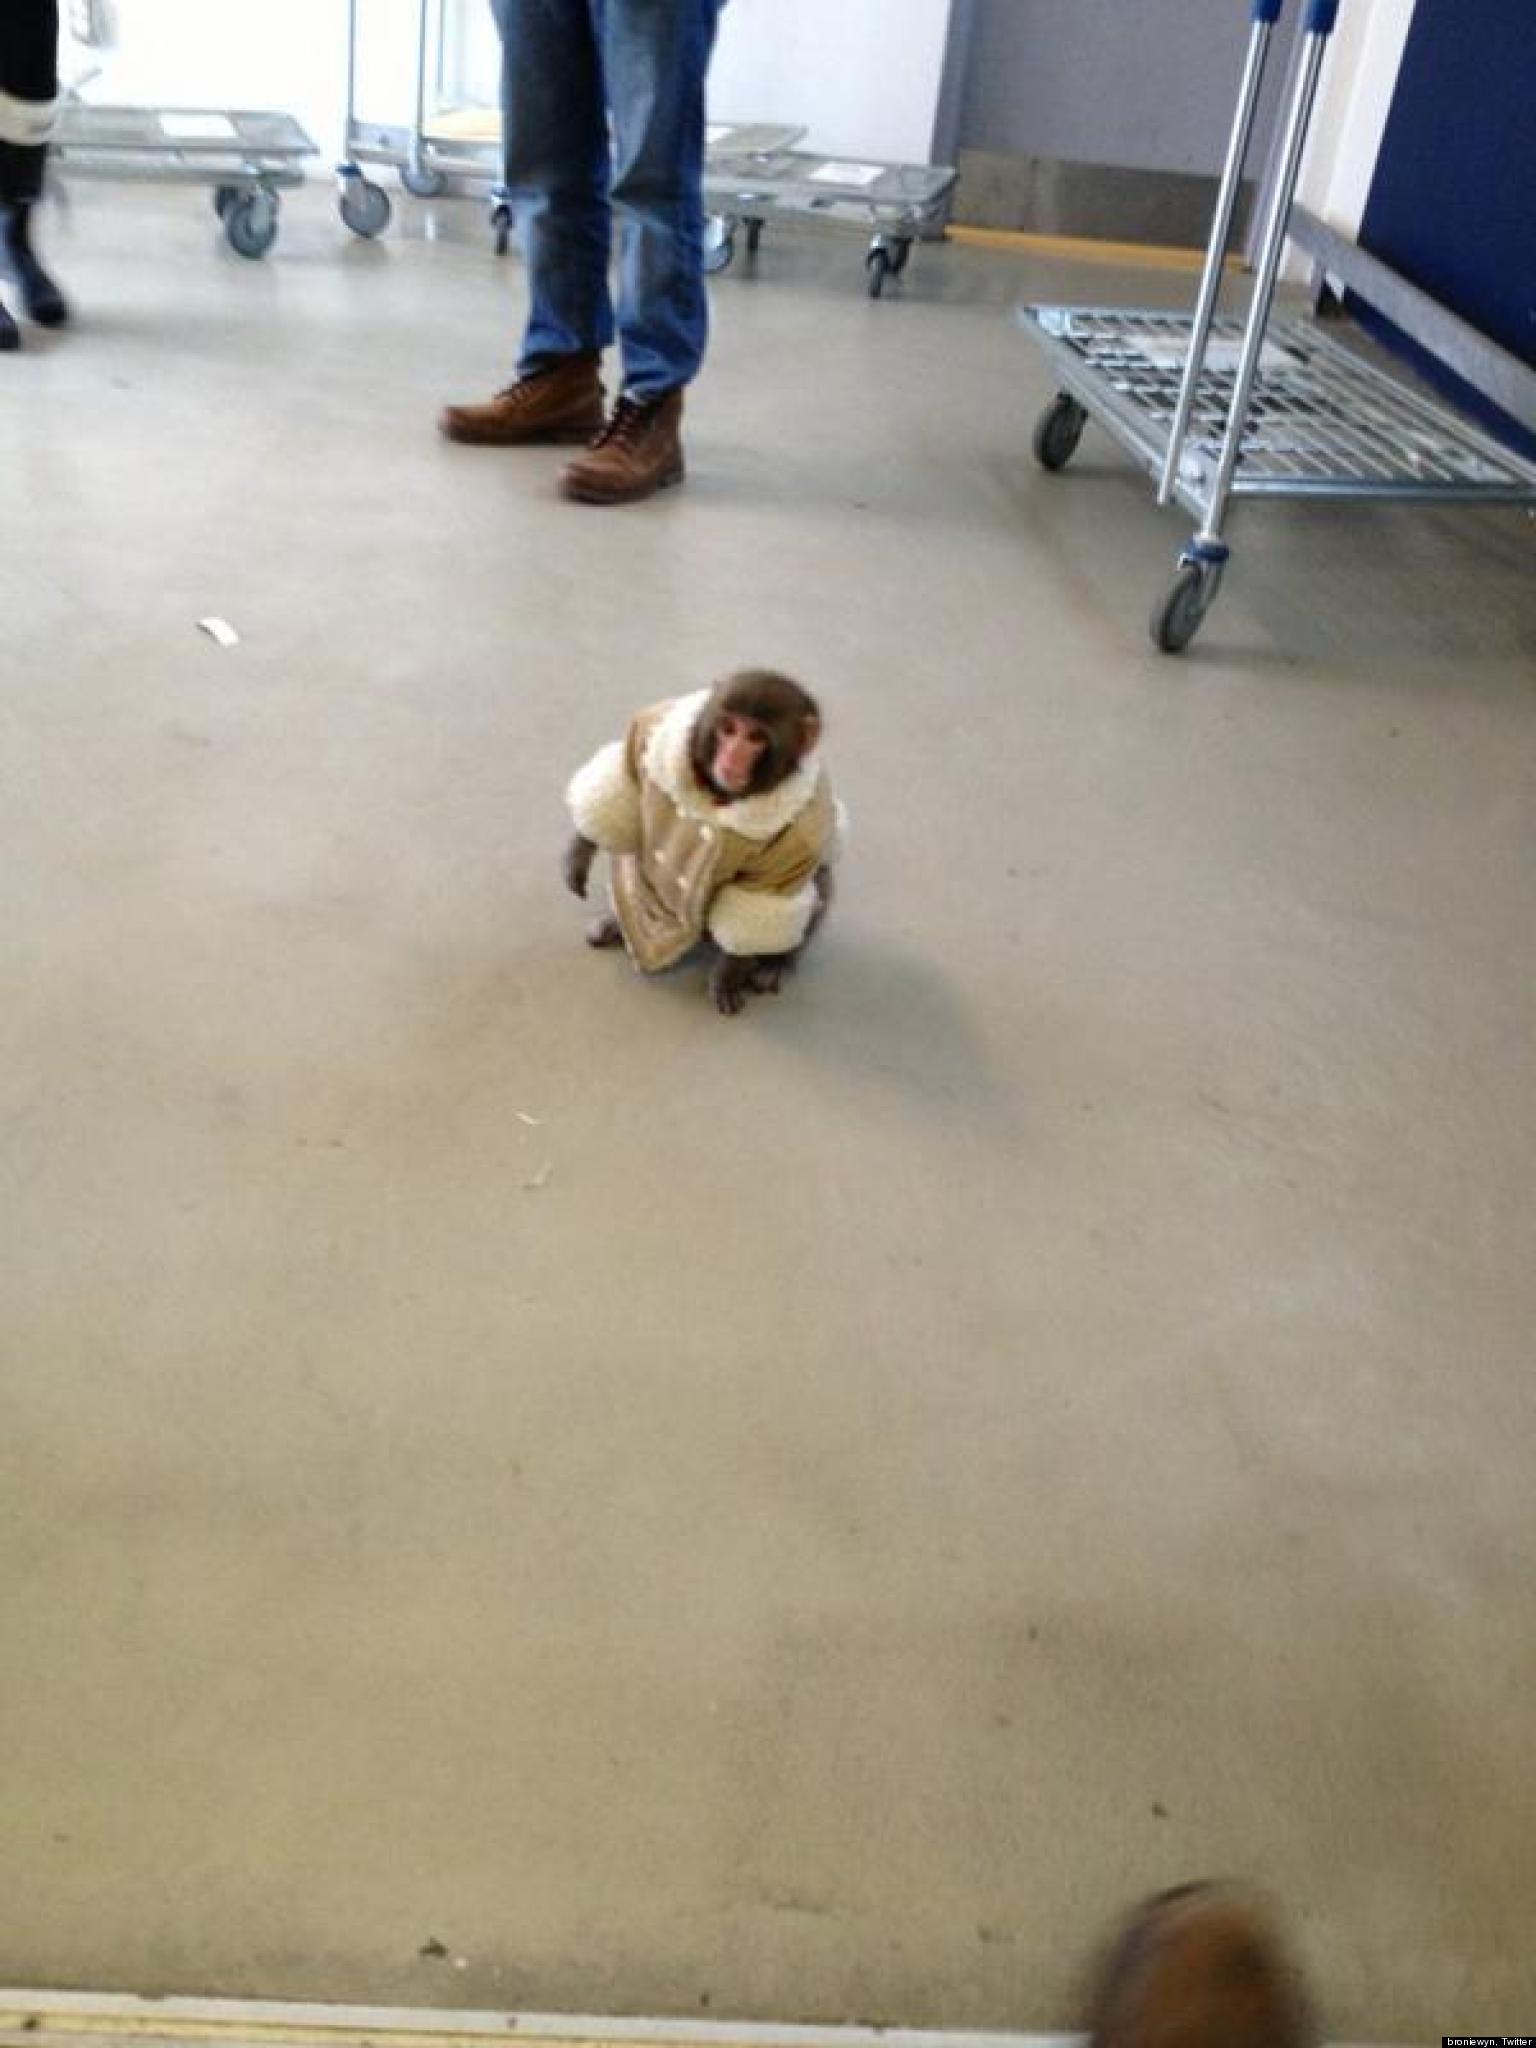 ikea monkey runs around in coat outside furniture store in